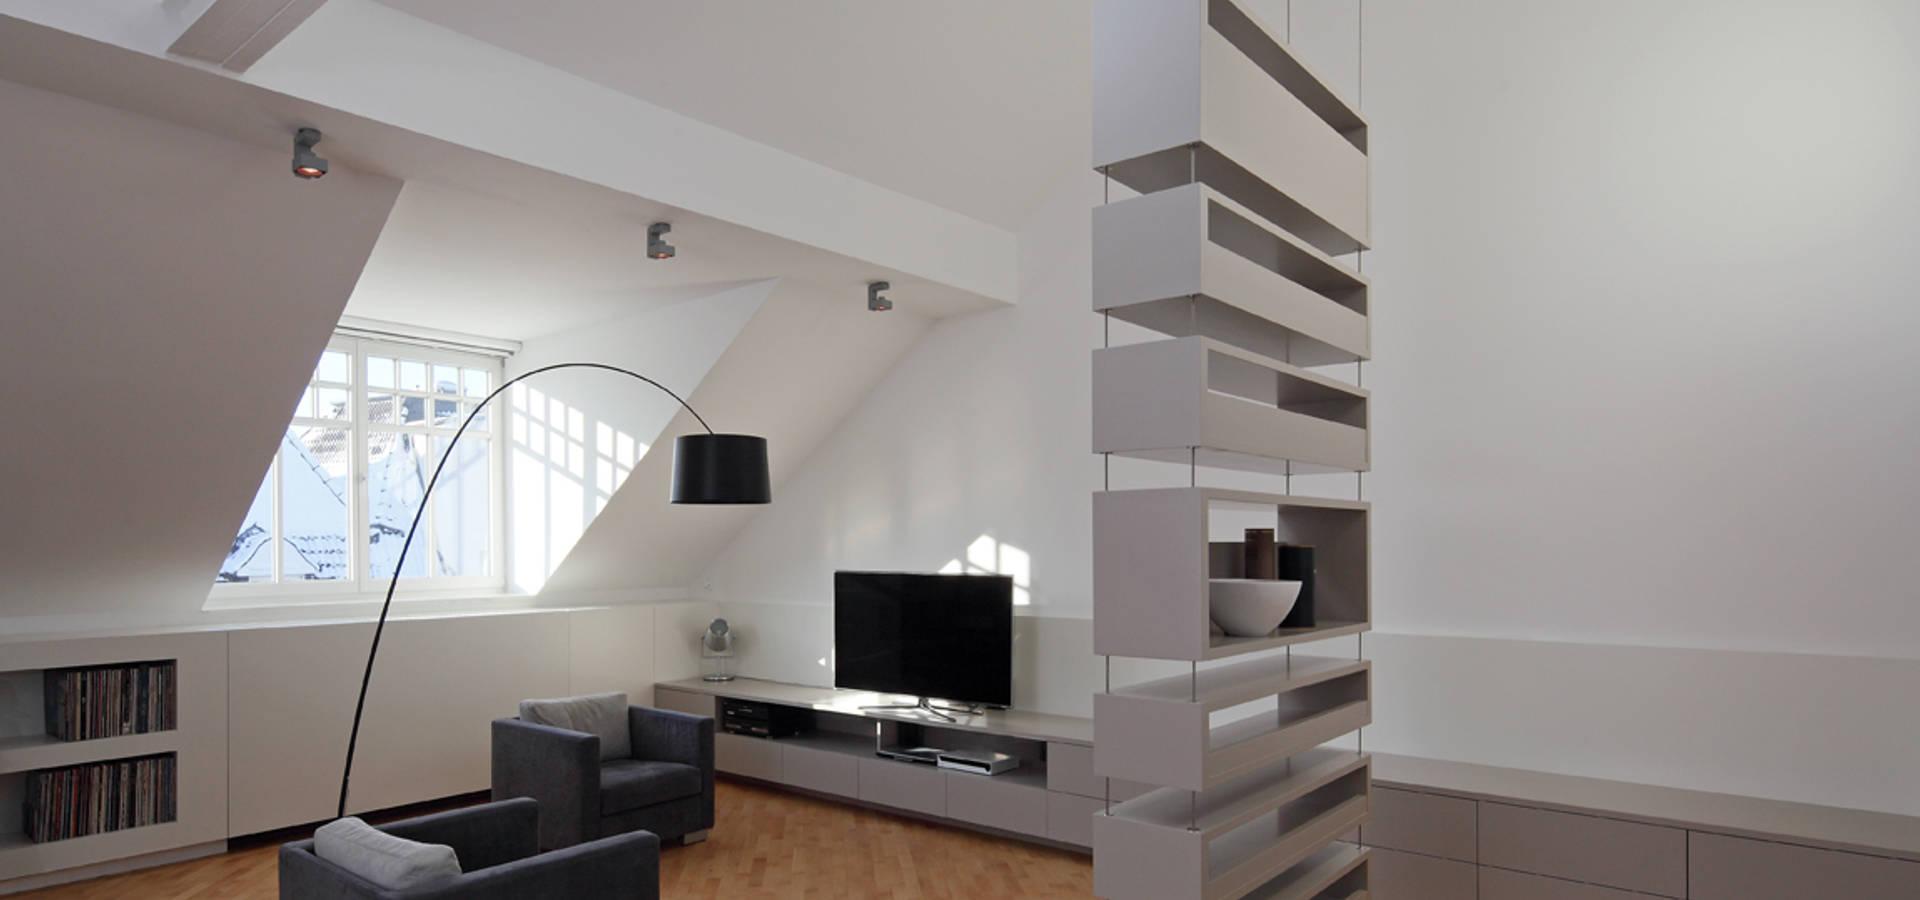 raumkontor innenarchitektur architektur arquitectos de. Black Bedroom Furniture Sets. Home Design Ideas